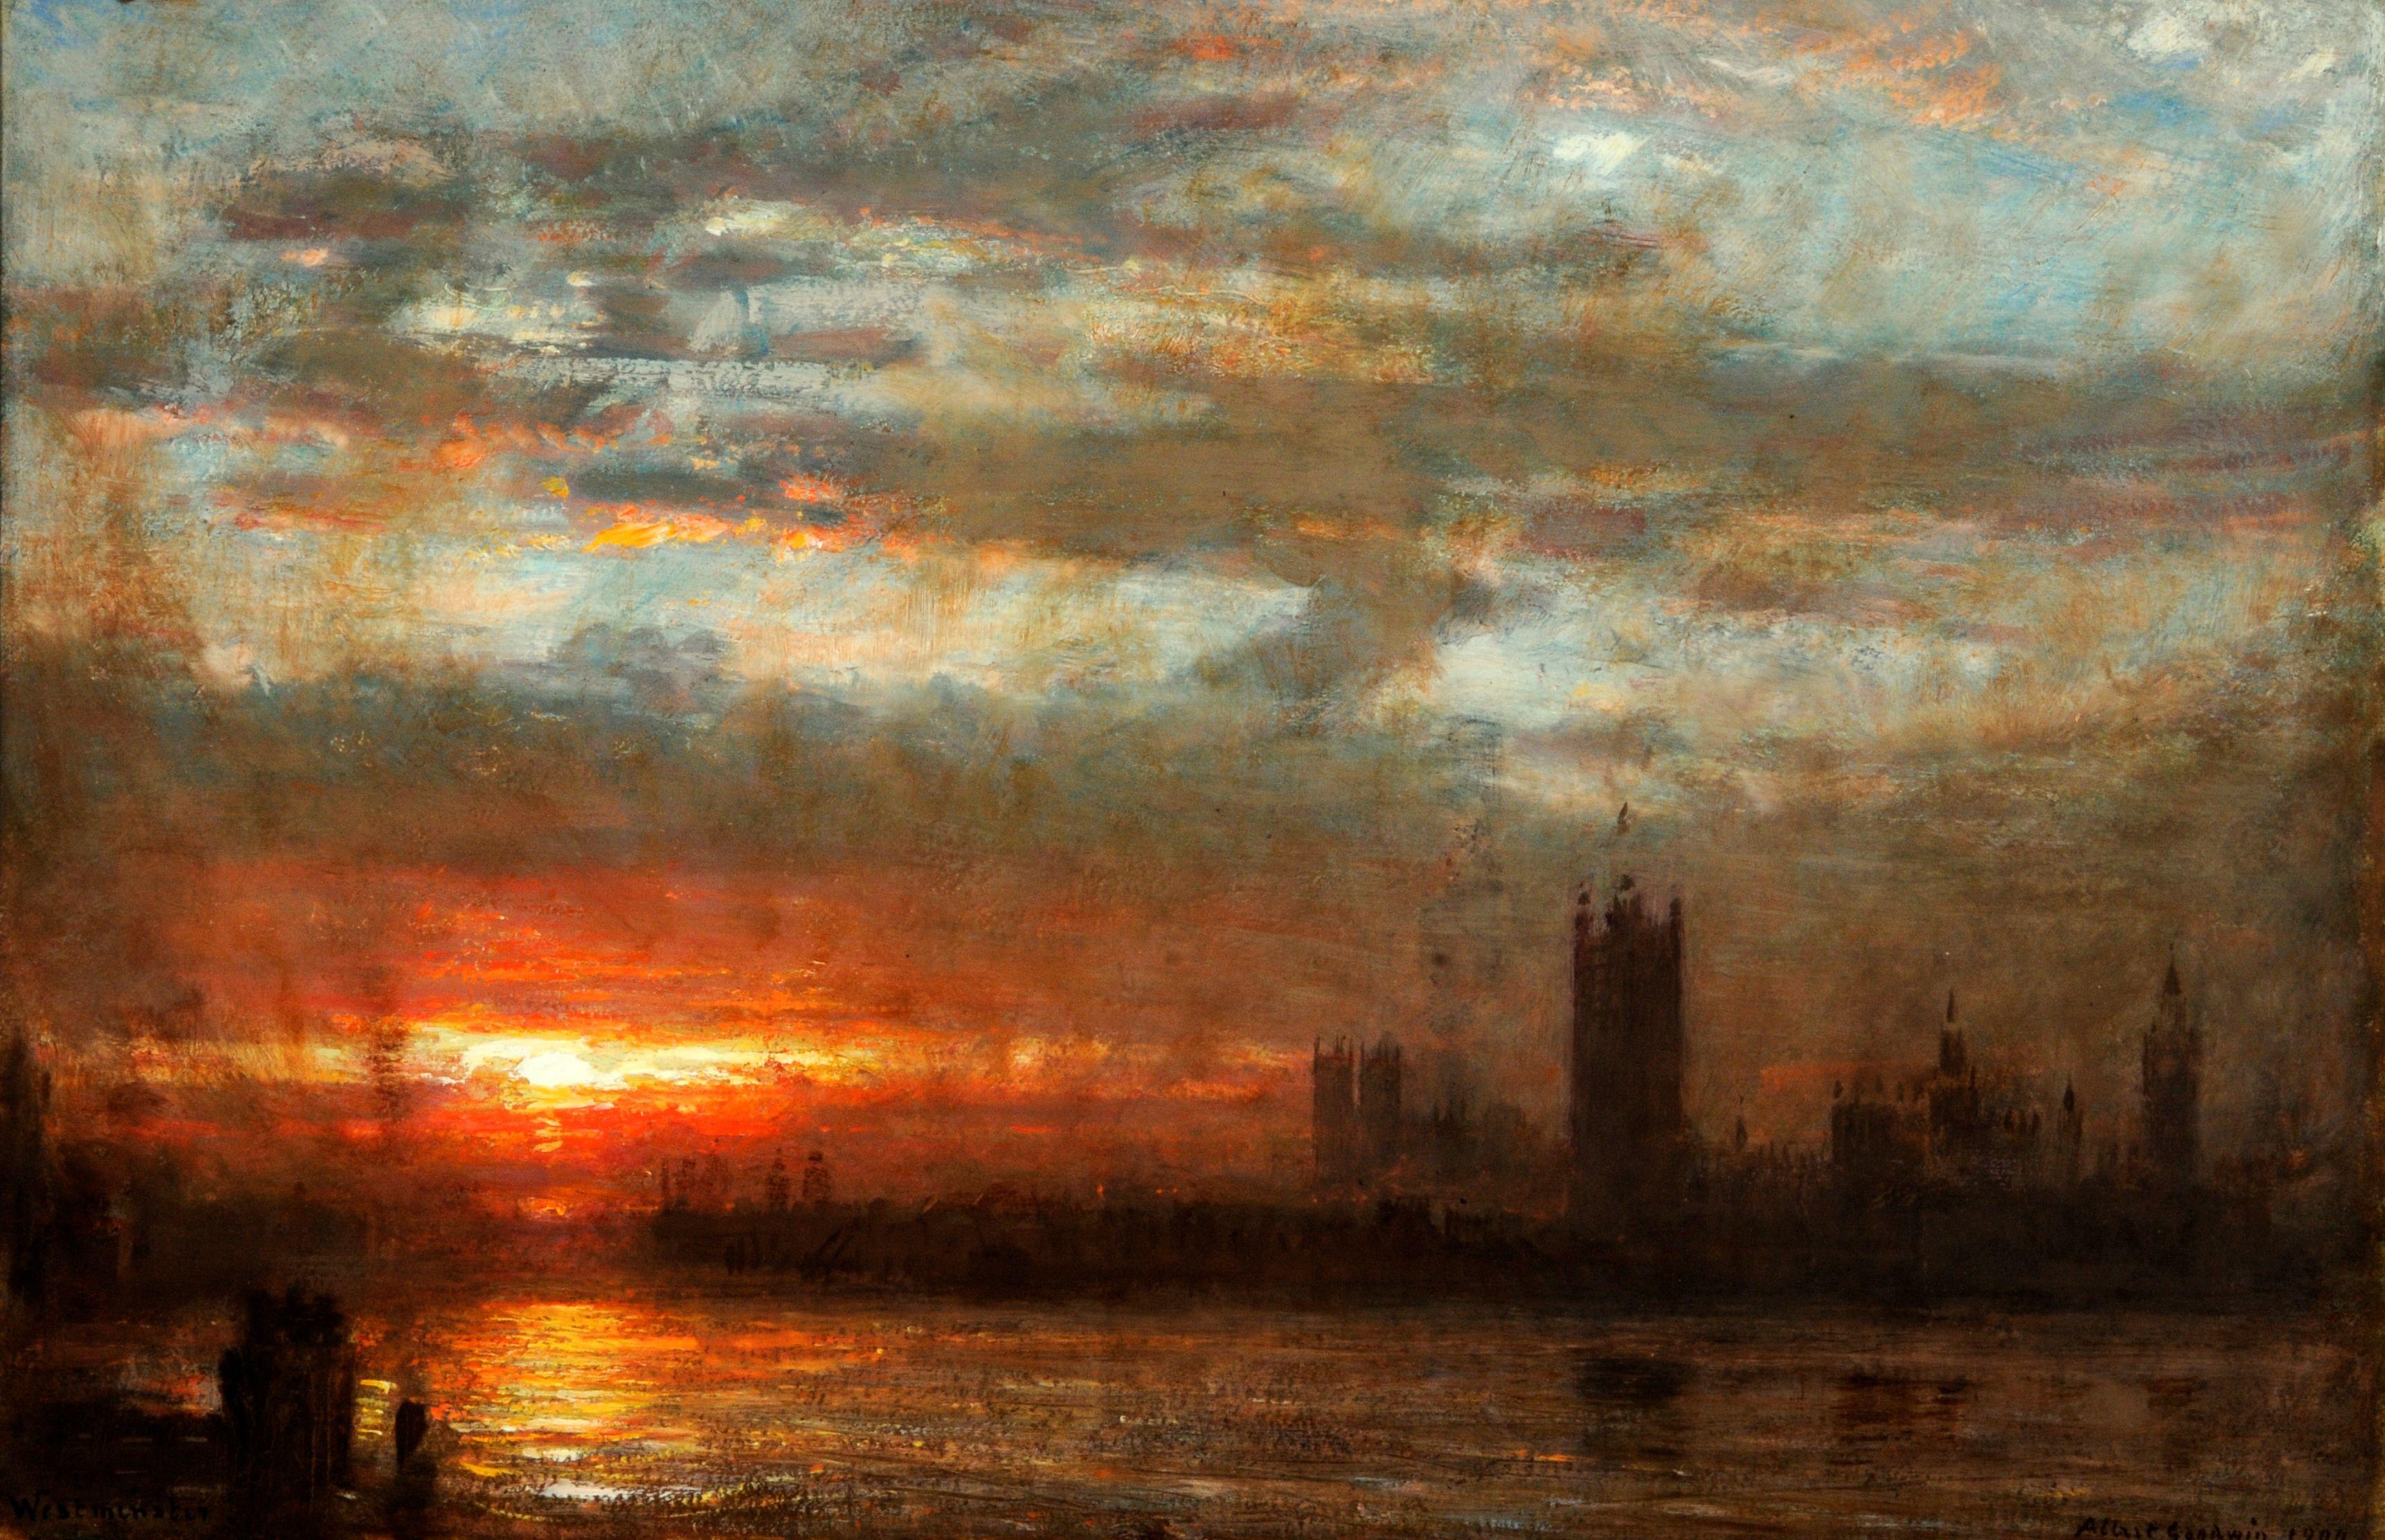 Albert goodwin 1900 westminster sunset misc art for Artwork landscapes